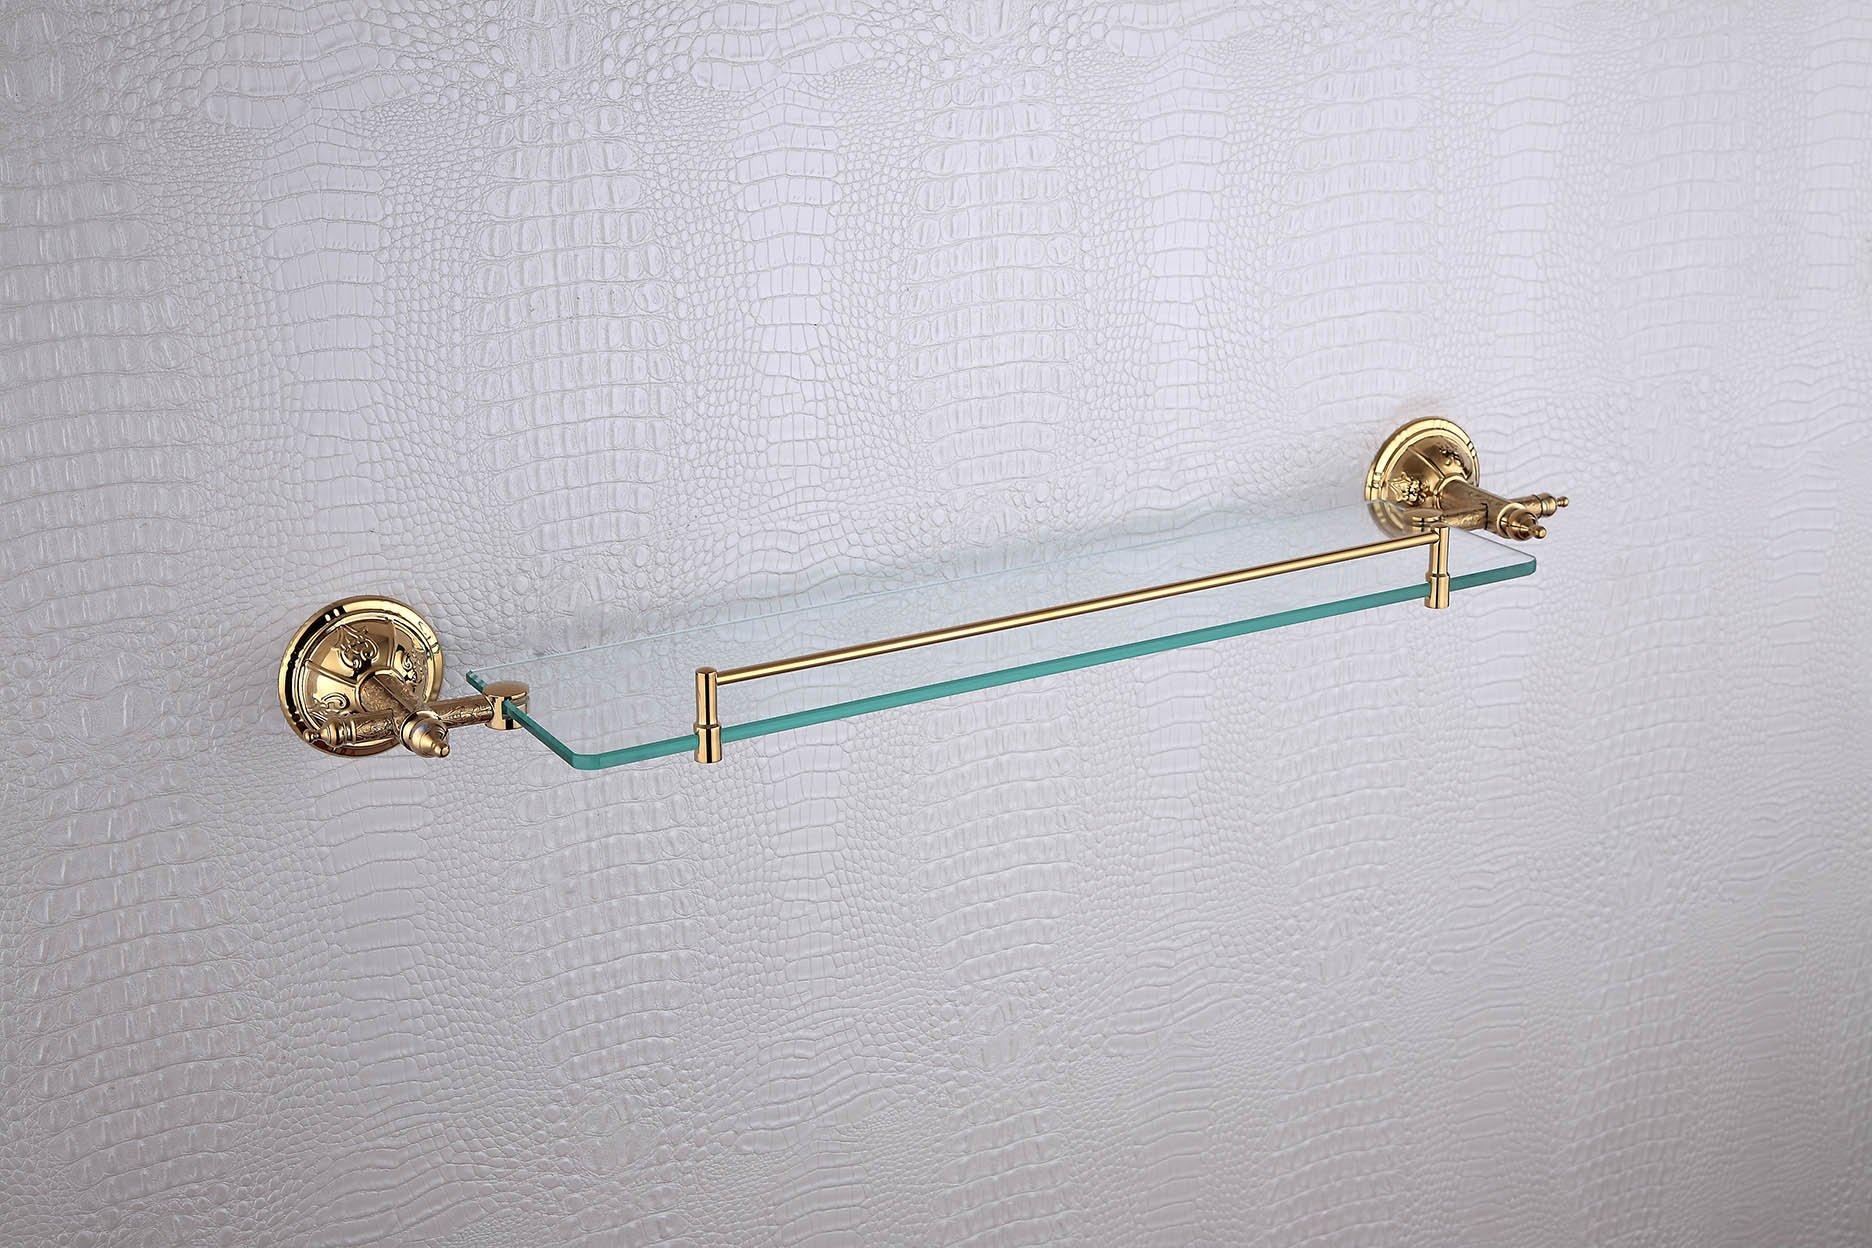 Cloud Power Royal Style Bathroom Brass Single Glass Shelves Single Glass Shelves With Titanium Wall-mounted Single Glass Shelves